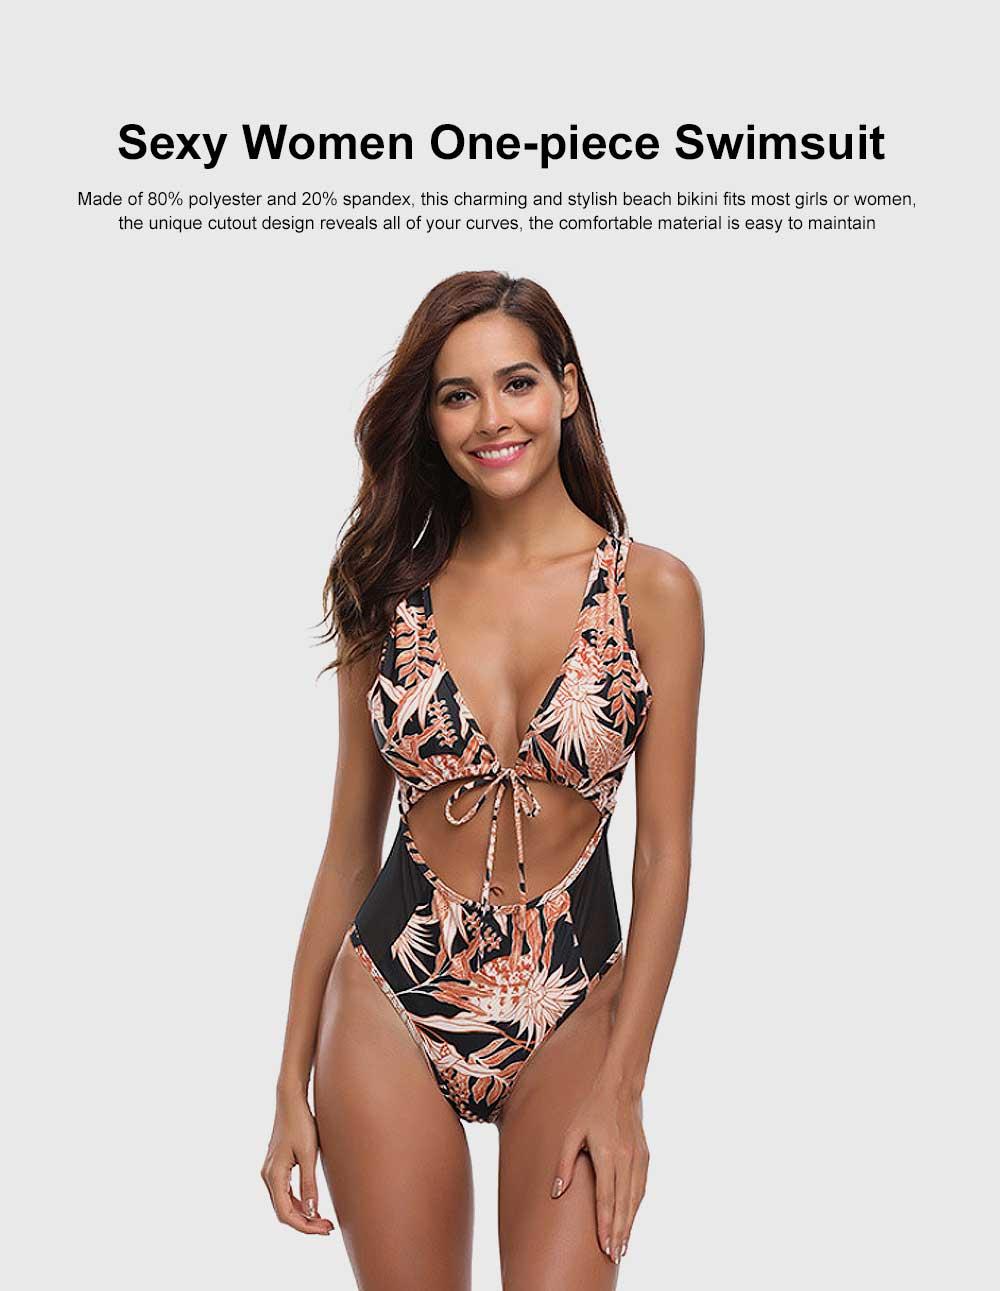 Sexy Women One-piece Swimsuit Padded Vintage Floral Bikini Swimming Bathing Wear 0